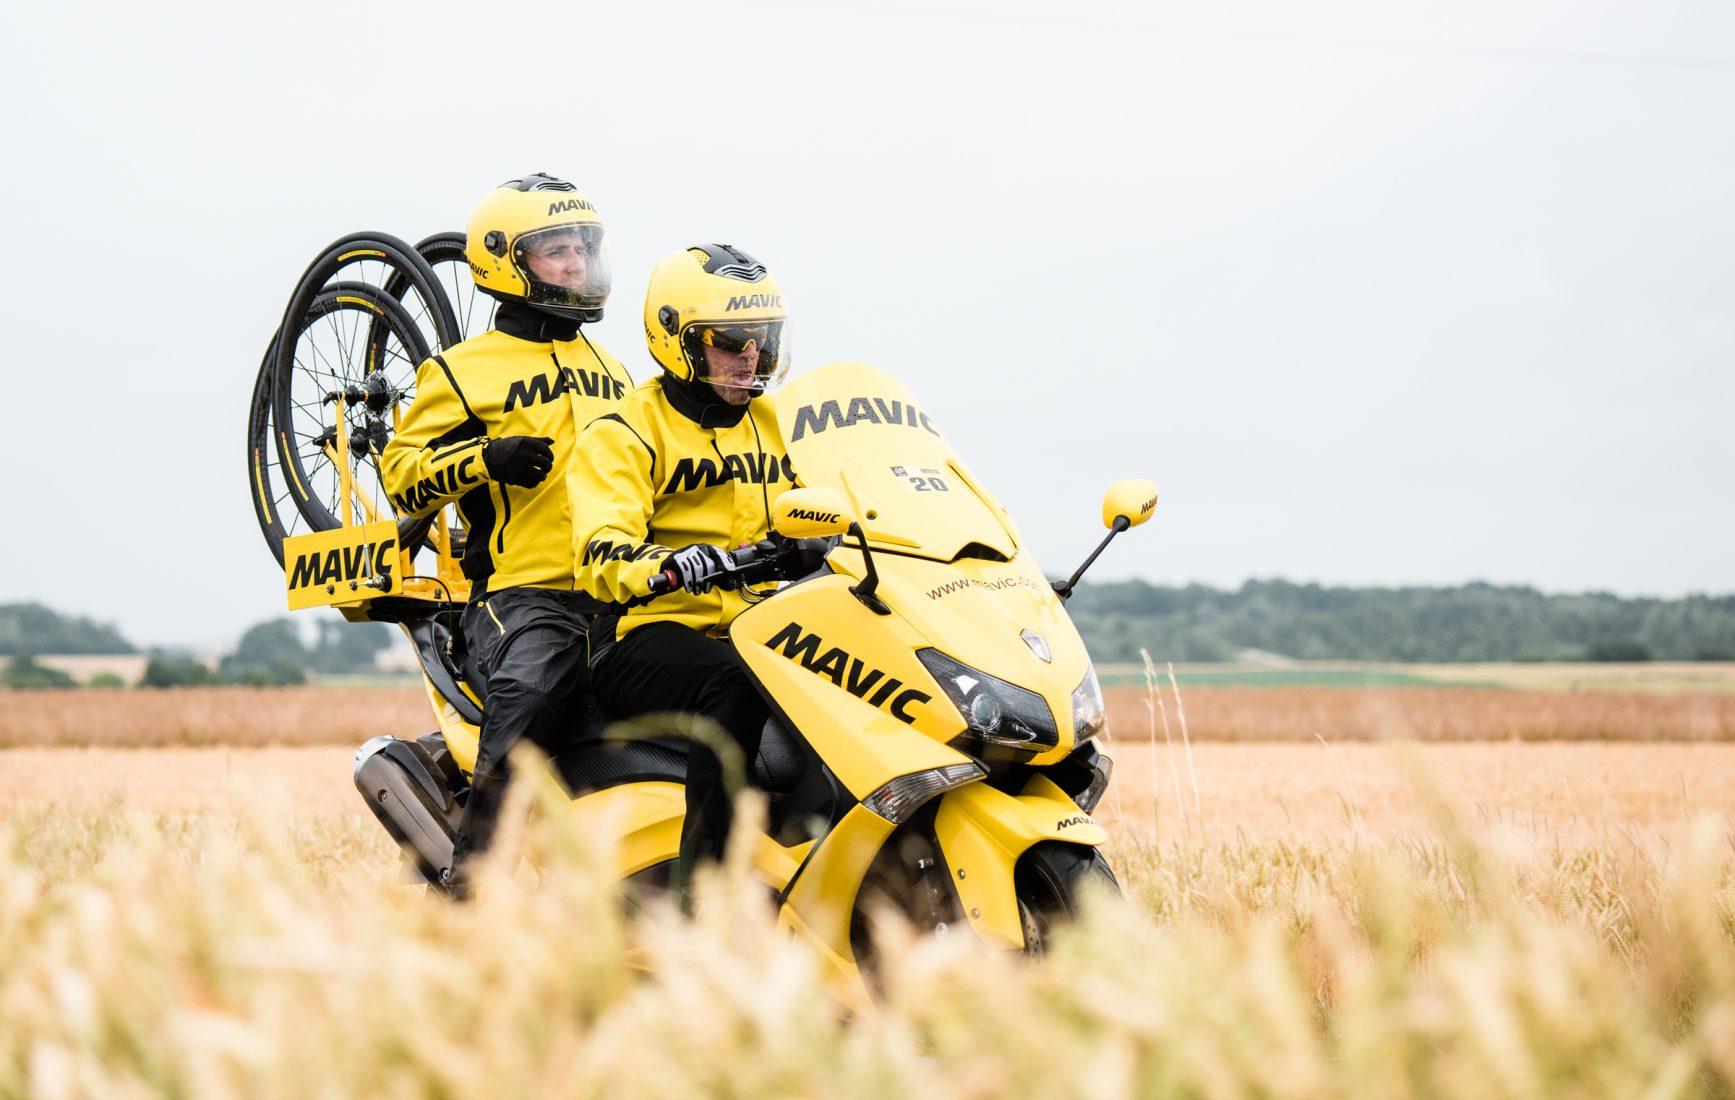 Bernard Hinault in soccorso di Mavic